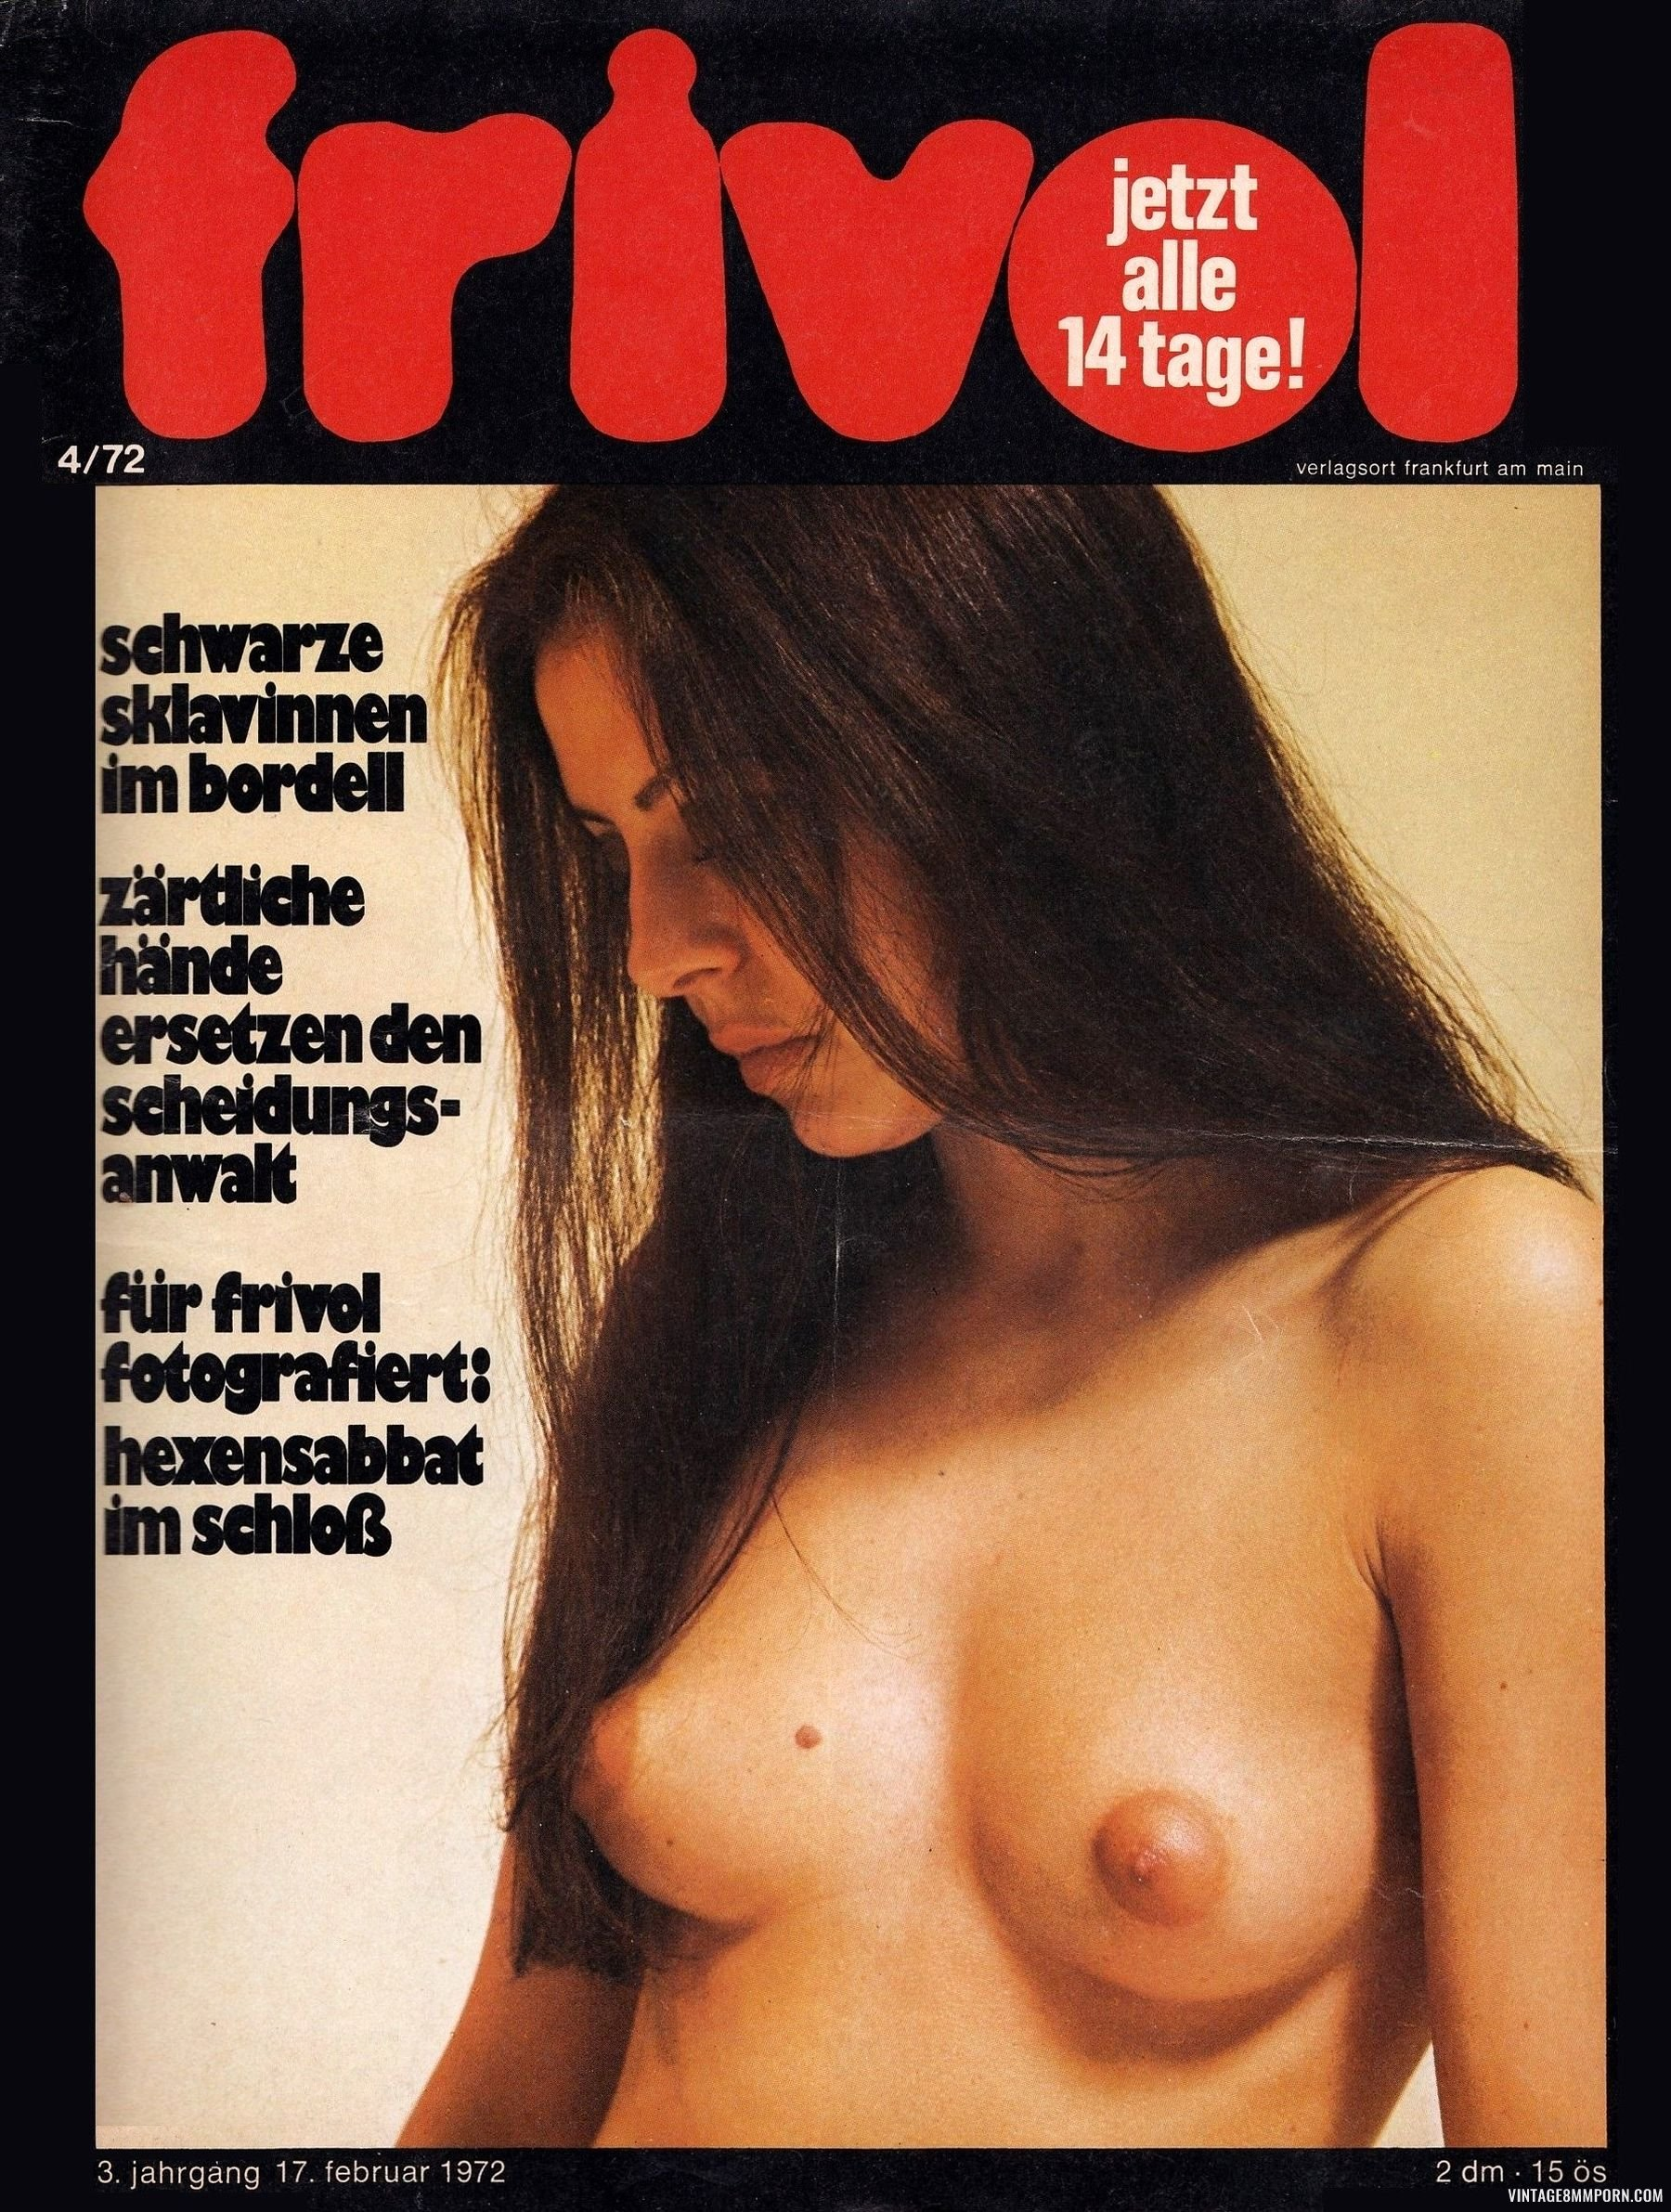 frivol ausgehen erotik bayreuth